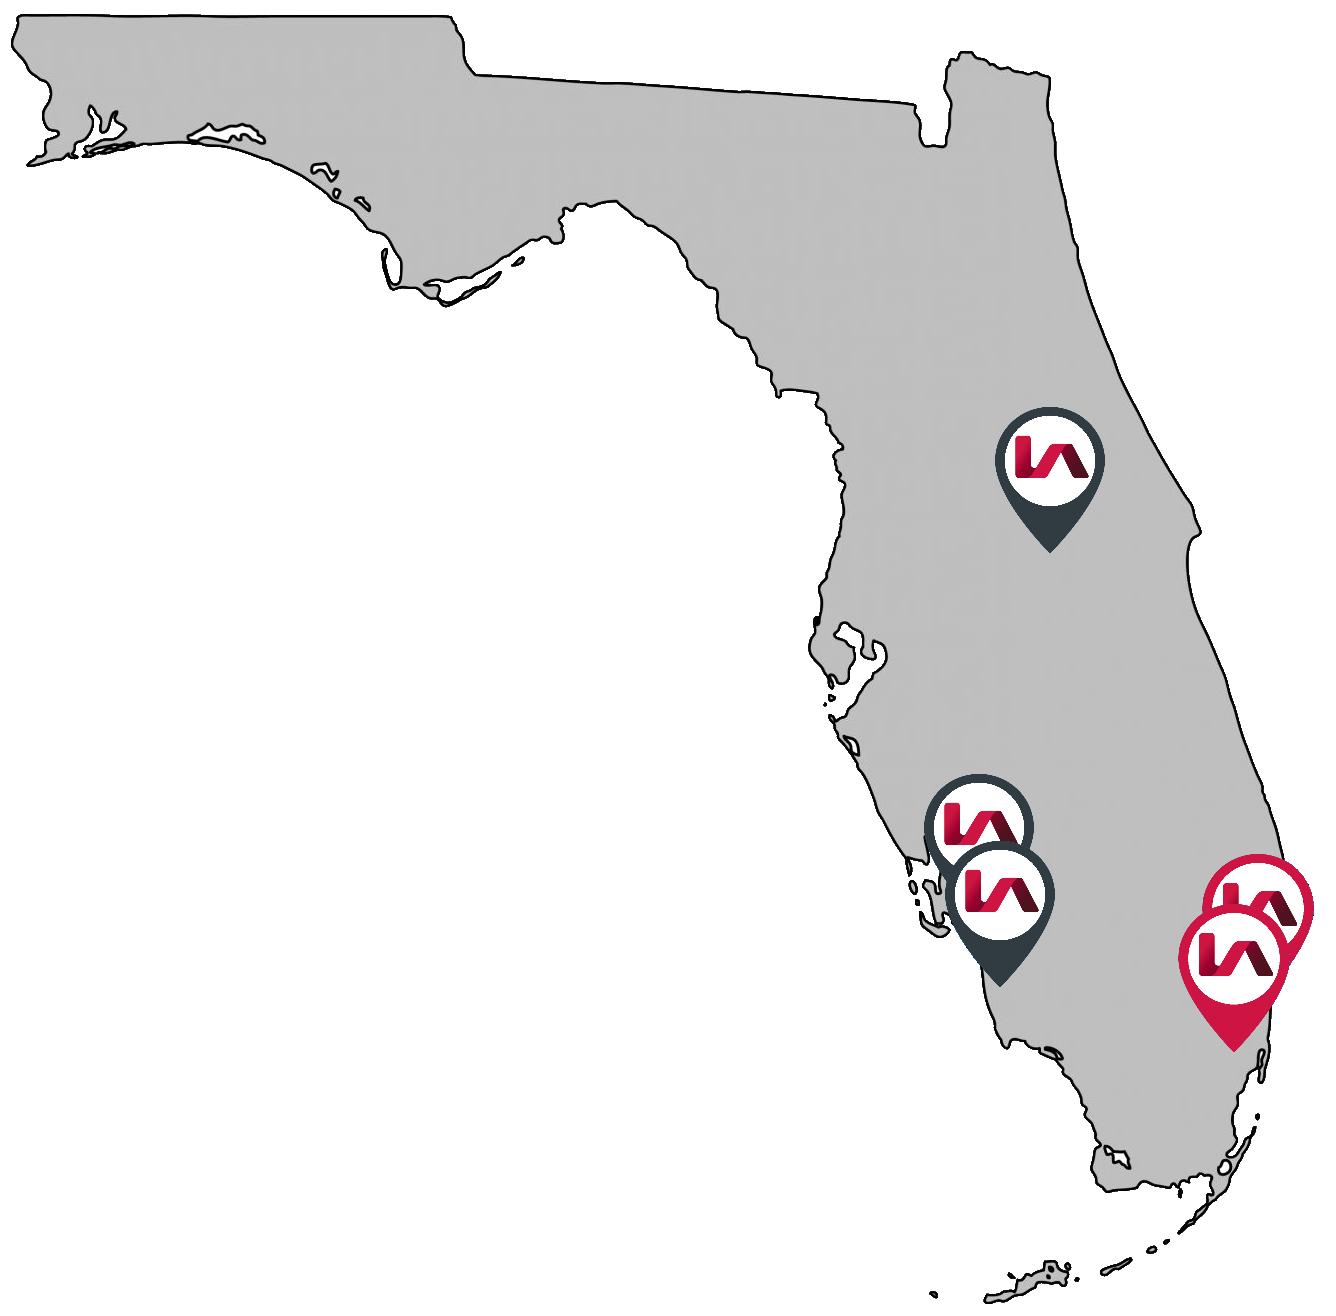 Lee & Associates South Florida Commercial Real Estate Services